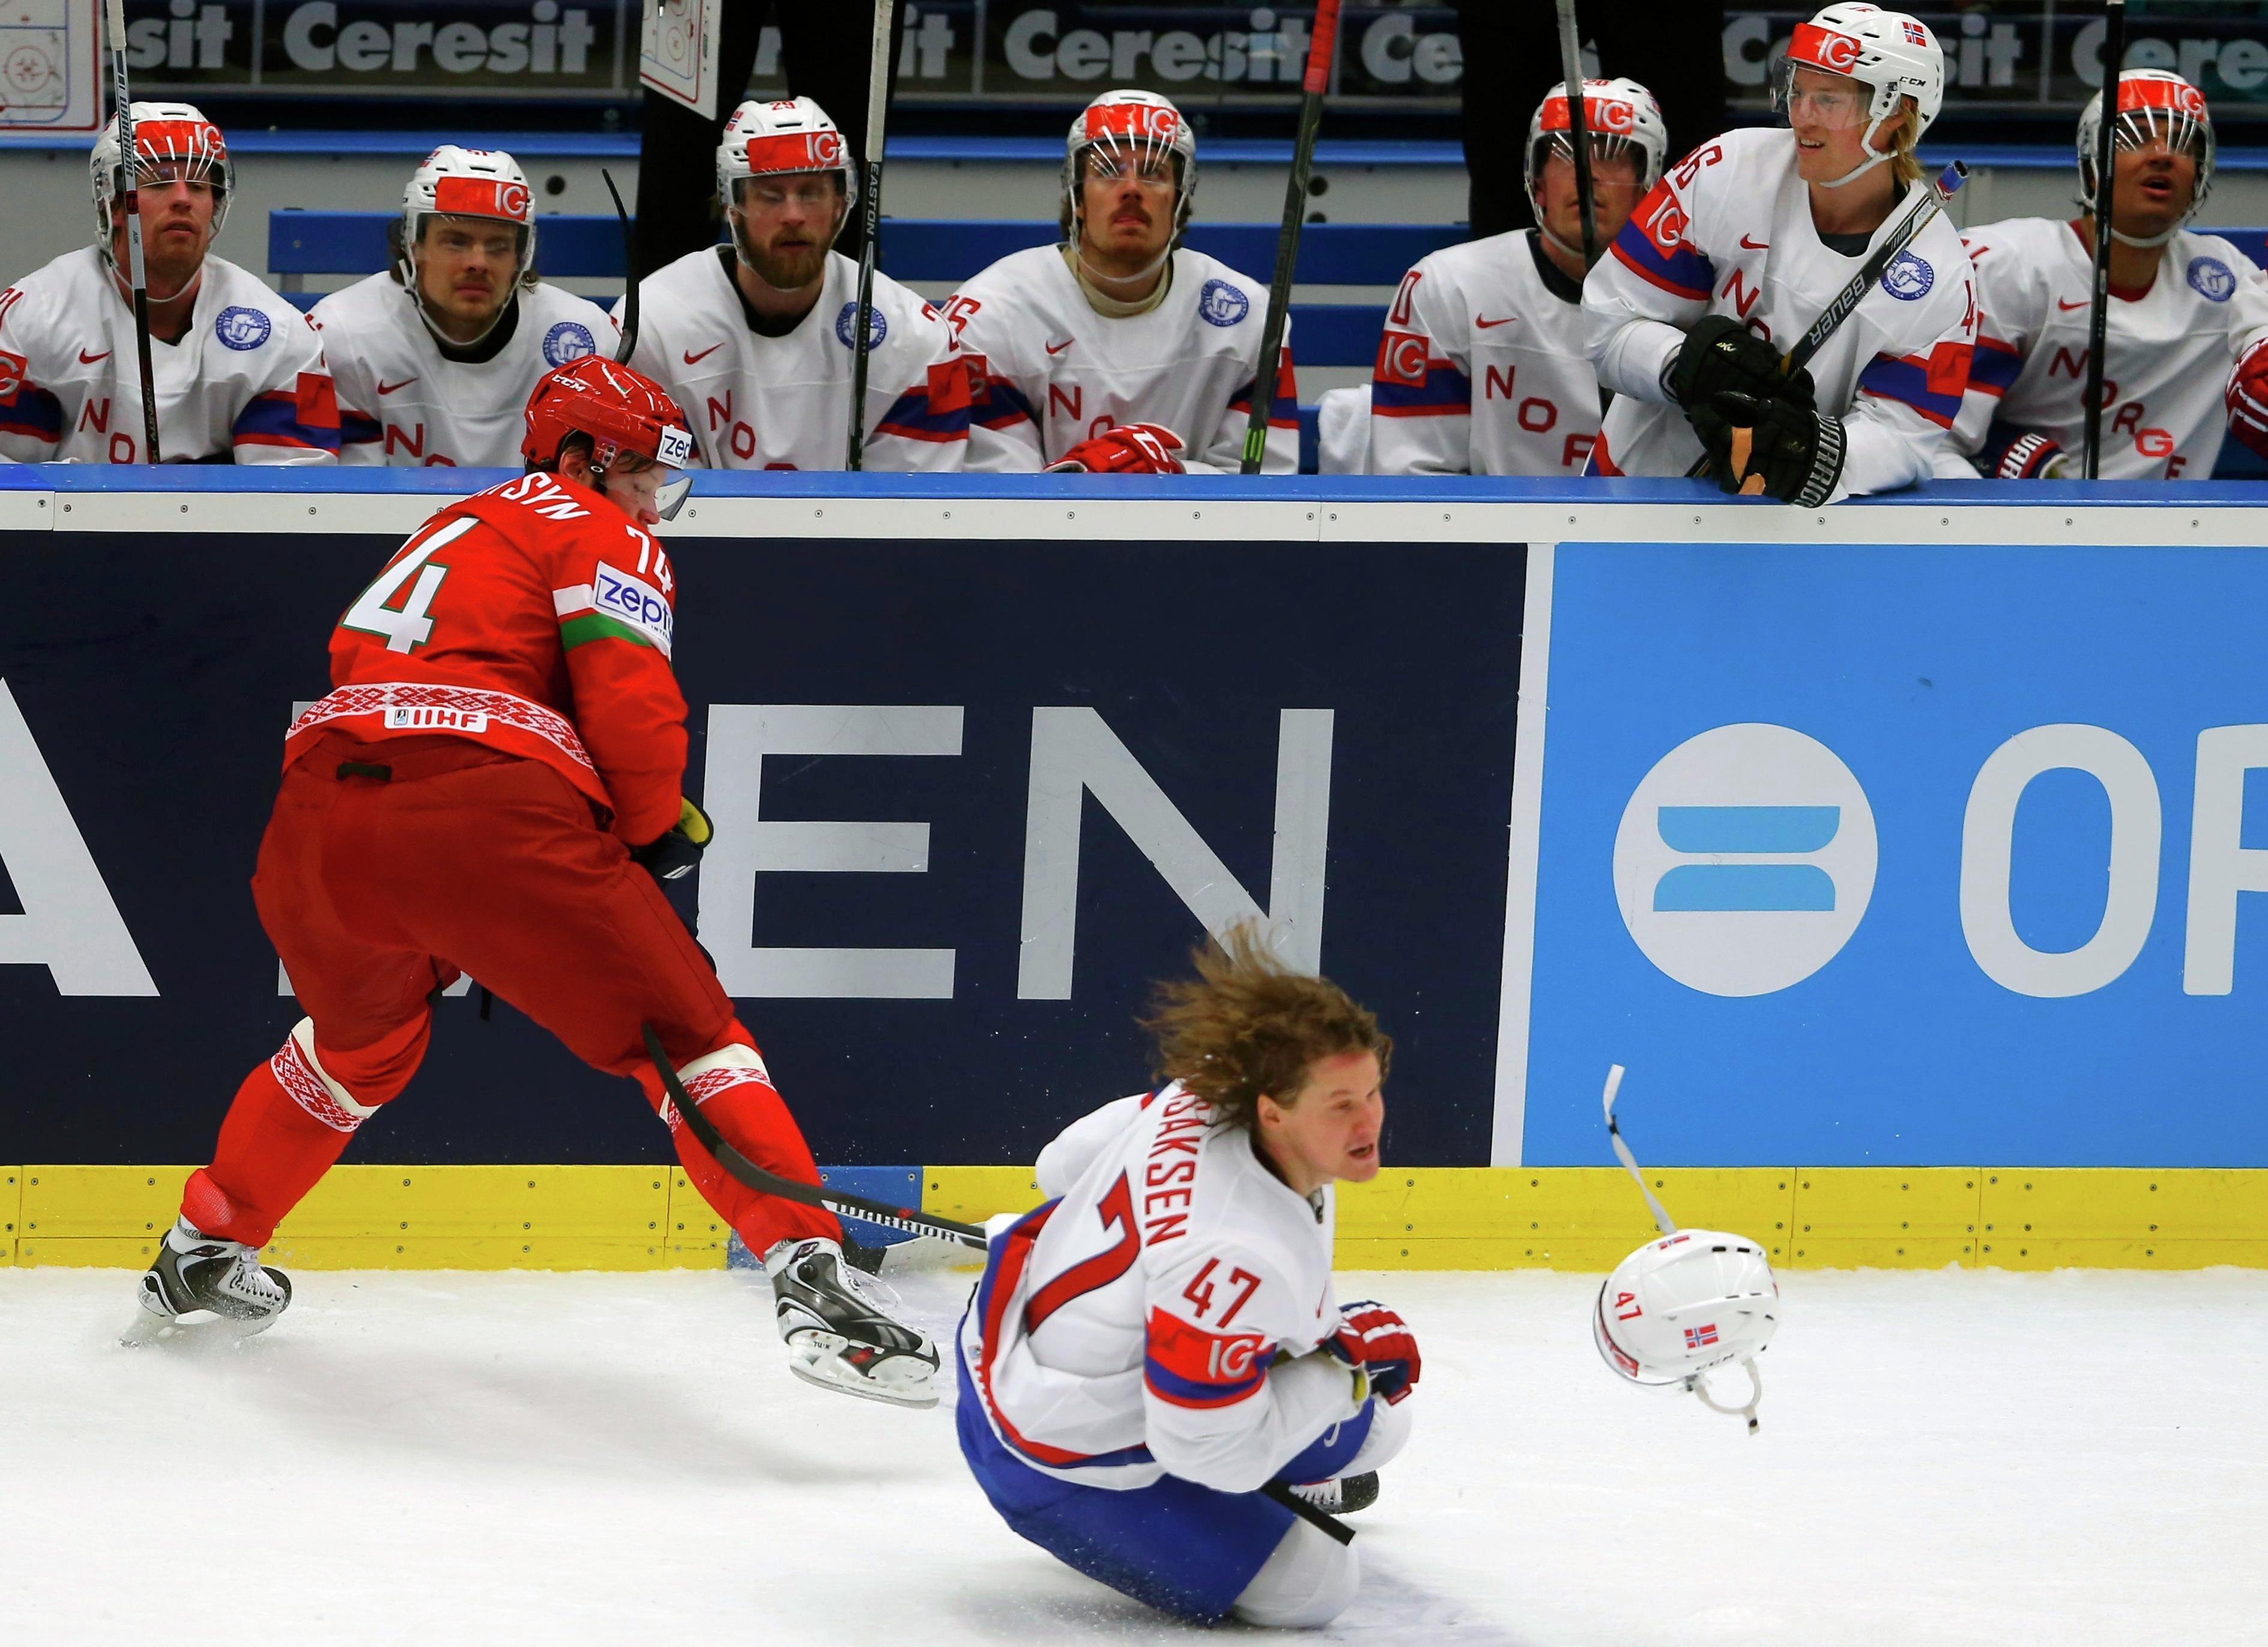 Норвежский хоккеист Александер Бонсаксен фолит на игроке сборной Беларуси Сергее Костицыне